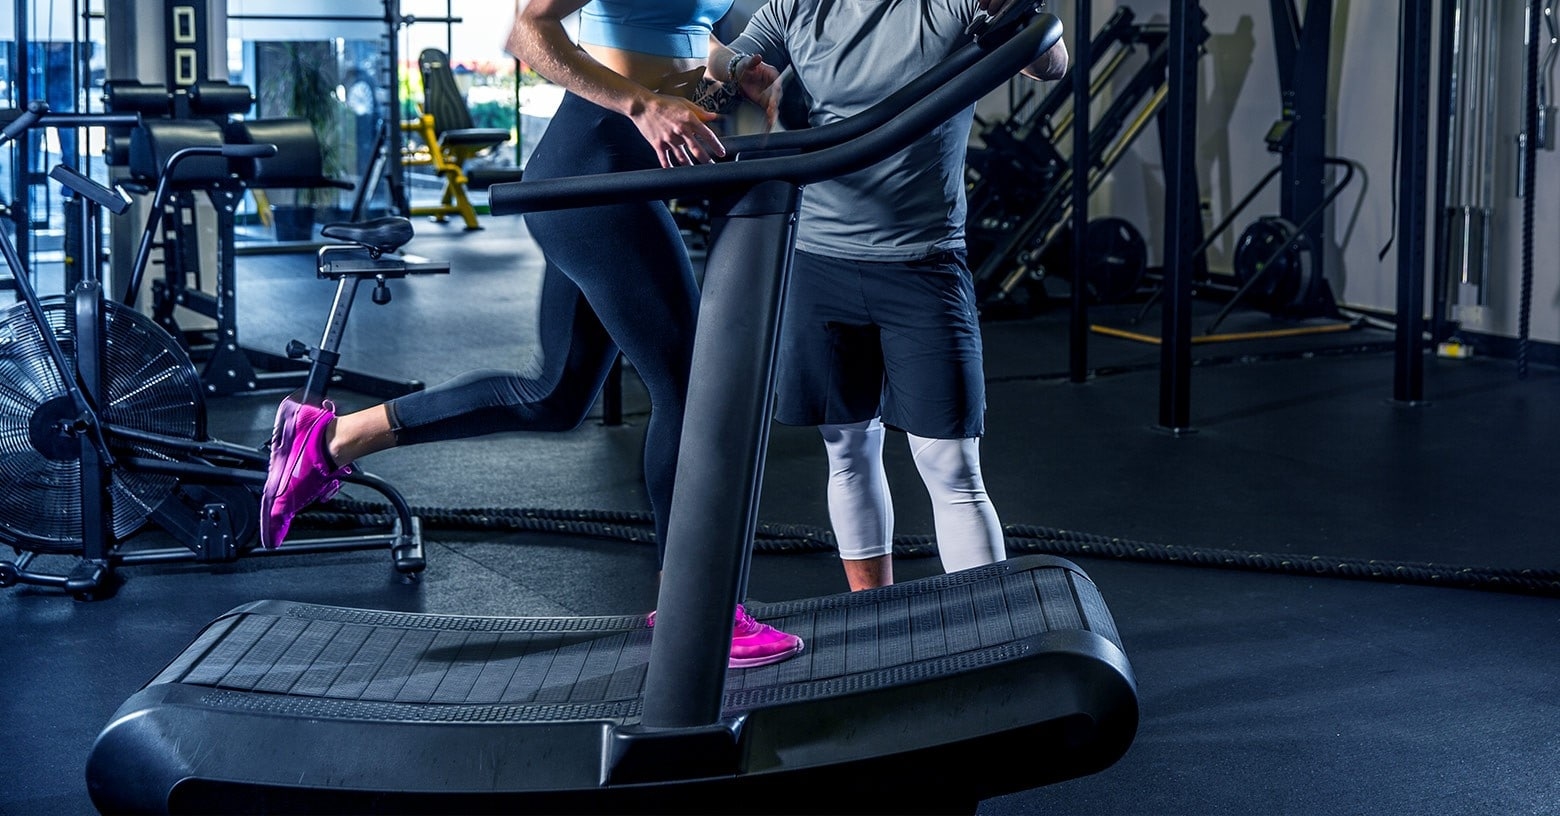 Different Types of Treadmills